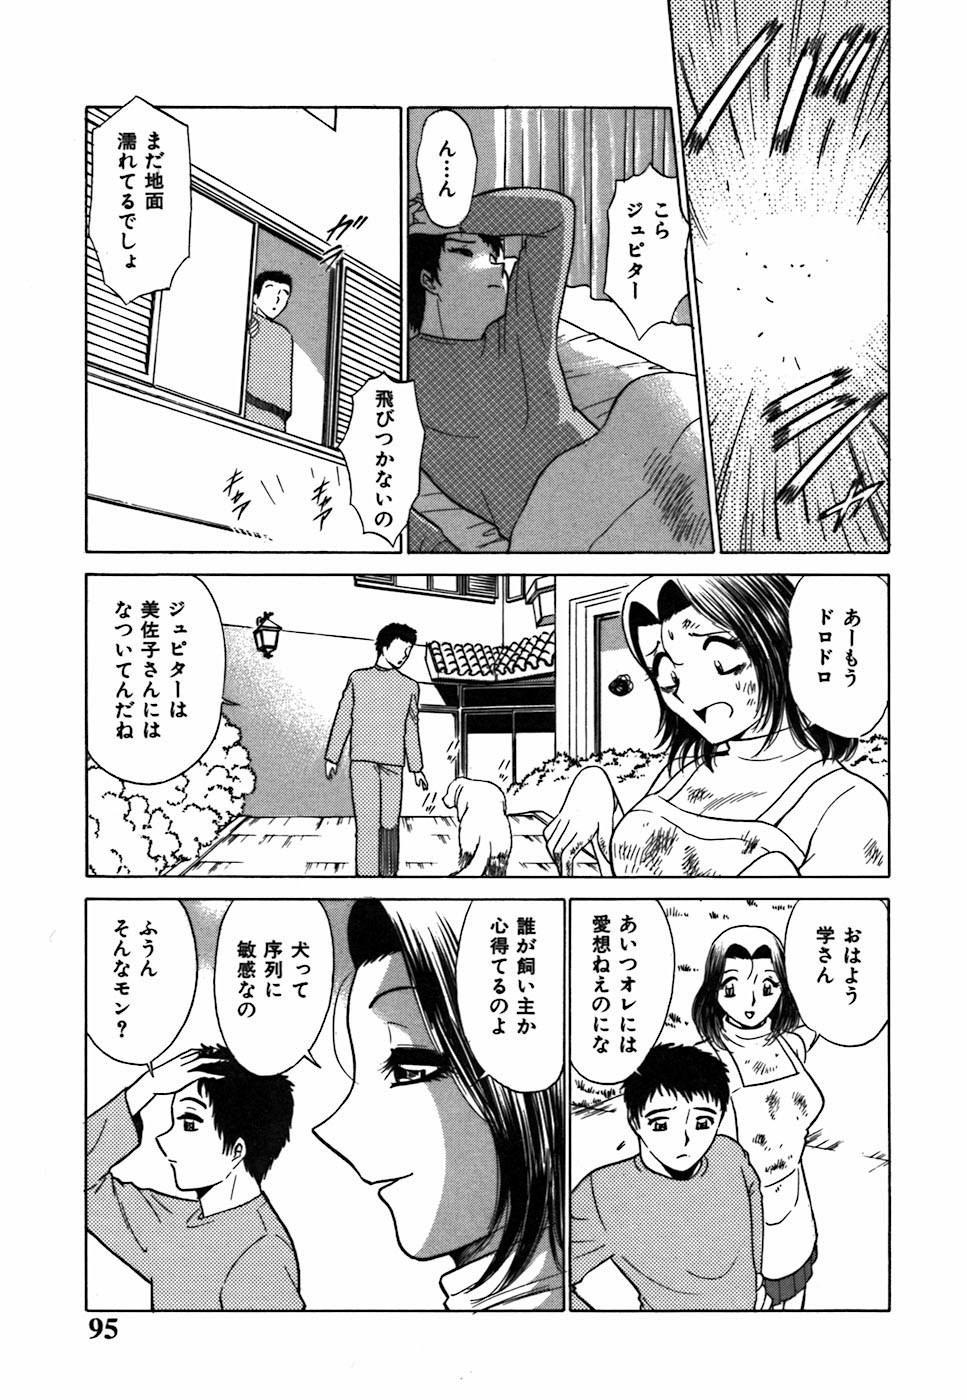 Kimi ga Nozomu Katachi | Appearance for which you hope 94